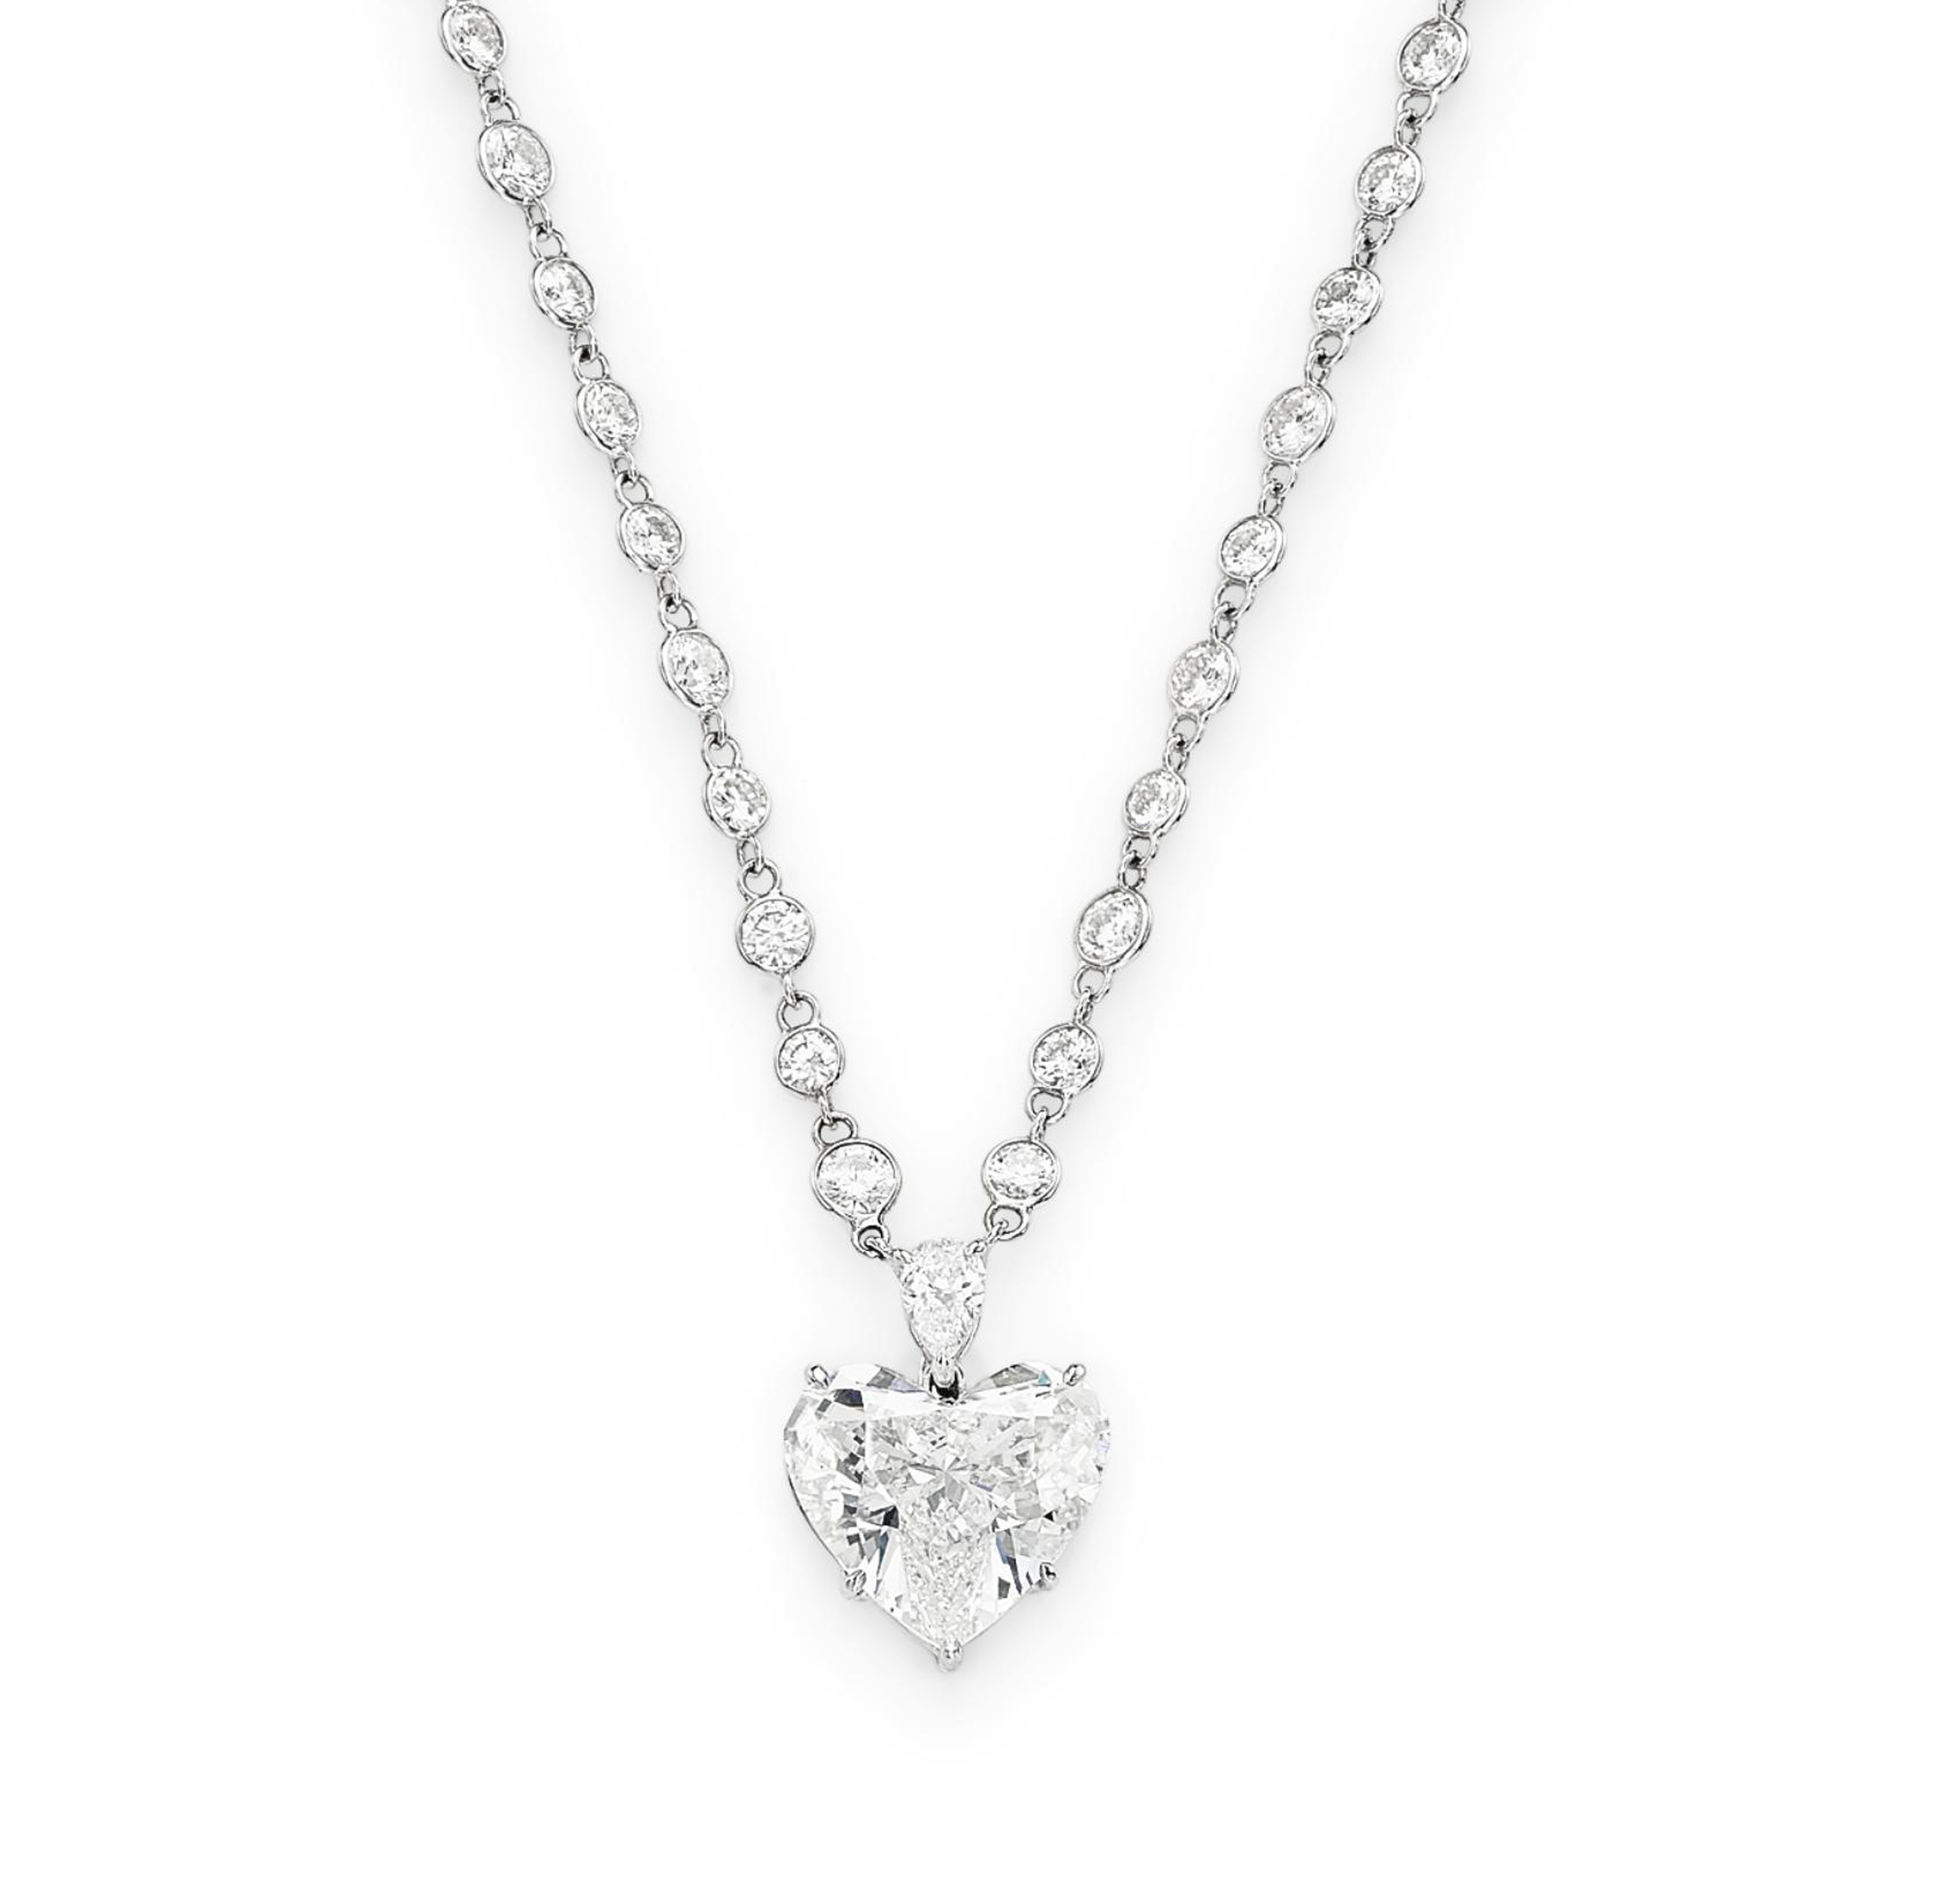 A DIAMOND PENDANT NECKLACE, BY SABBADINI